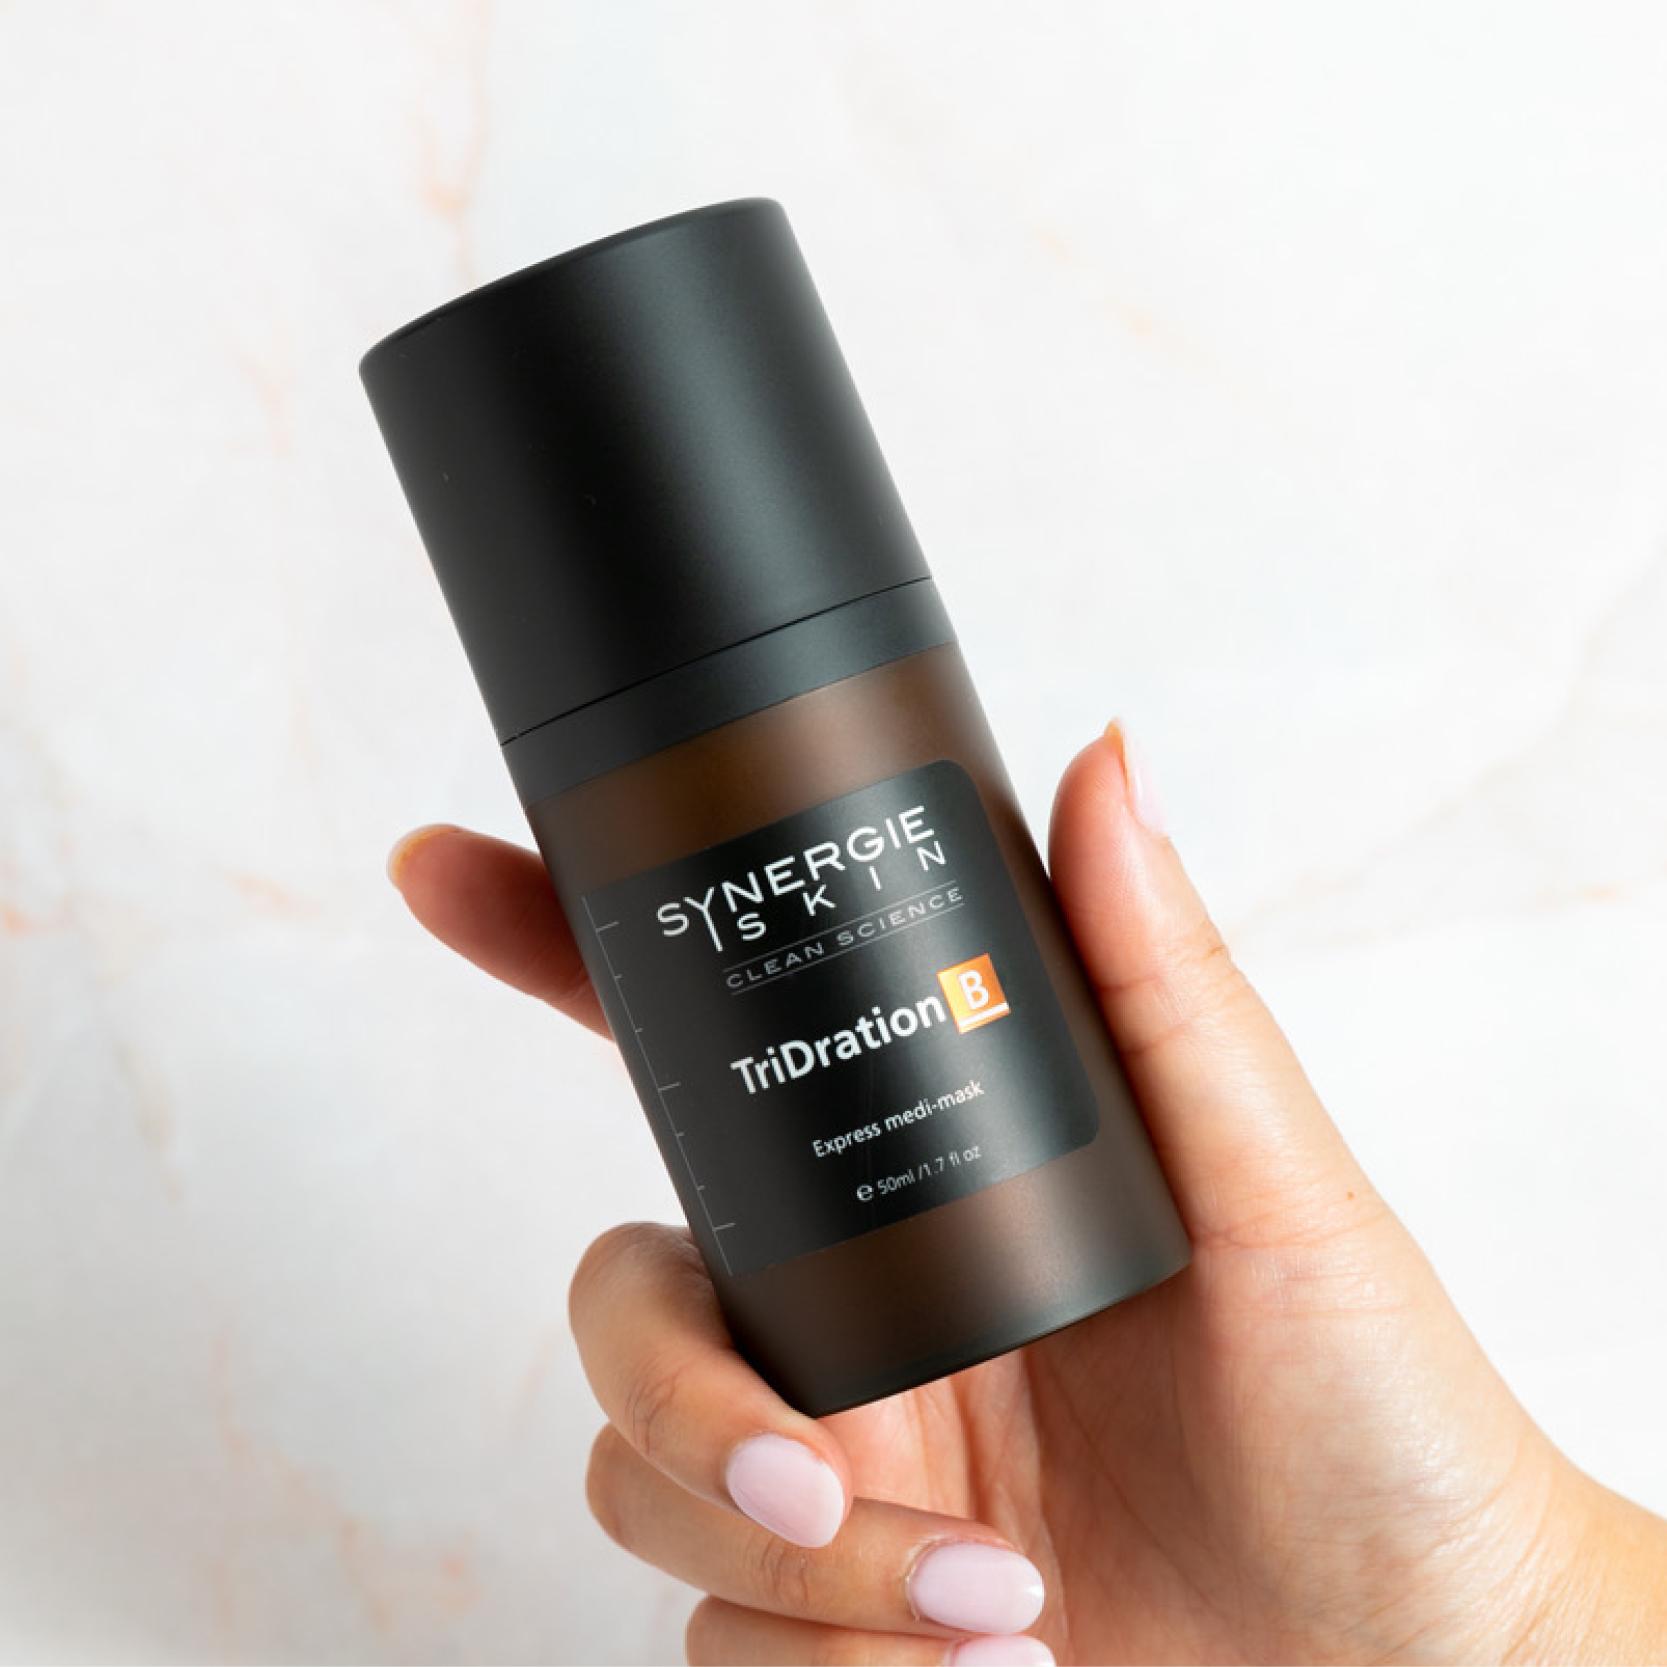 Synergie Skin TriDration B Express medi-mask